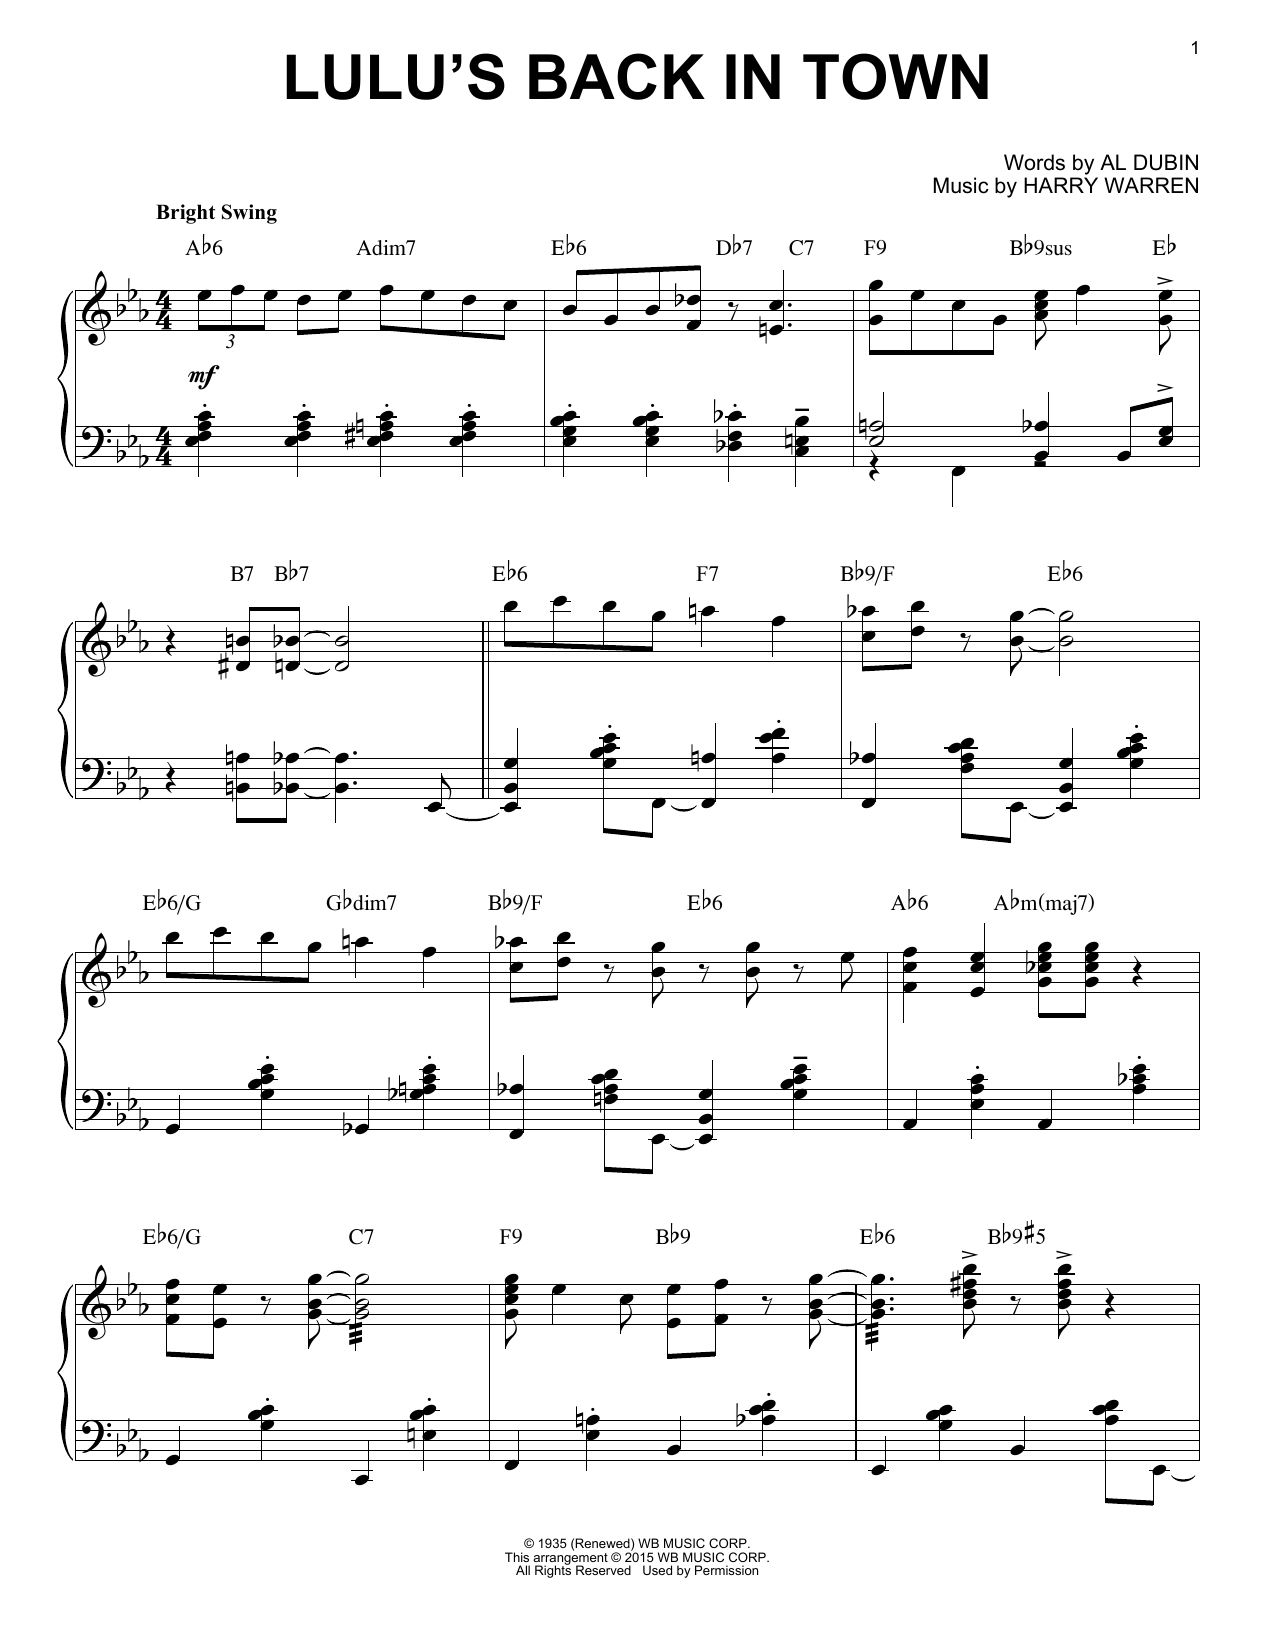 Al Dubin Lulu's Back In Town [Stride version] (arr. Brent Edstrom) sheet music notes and chords. Download Printable PDF.